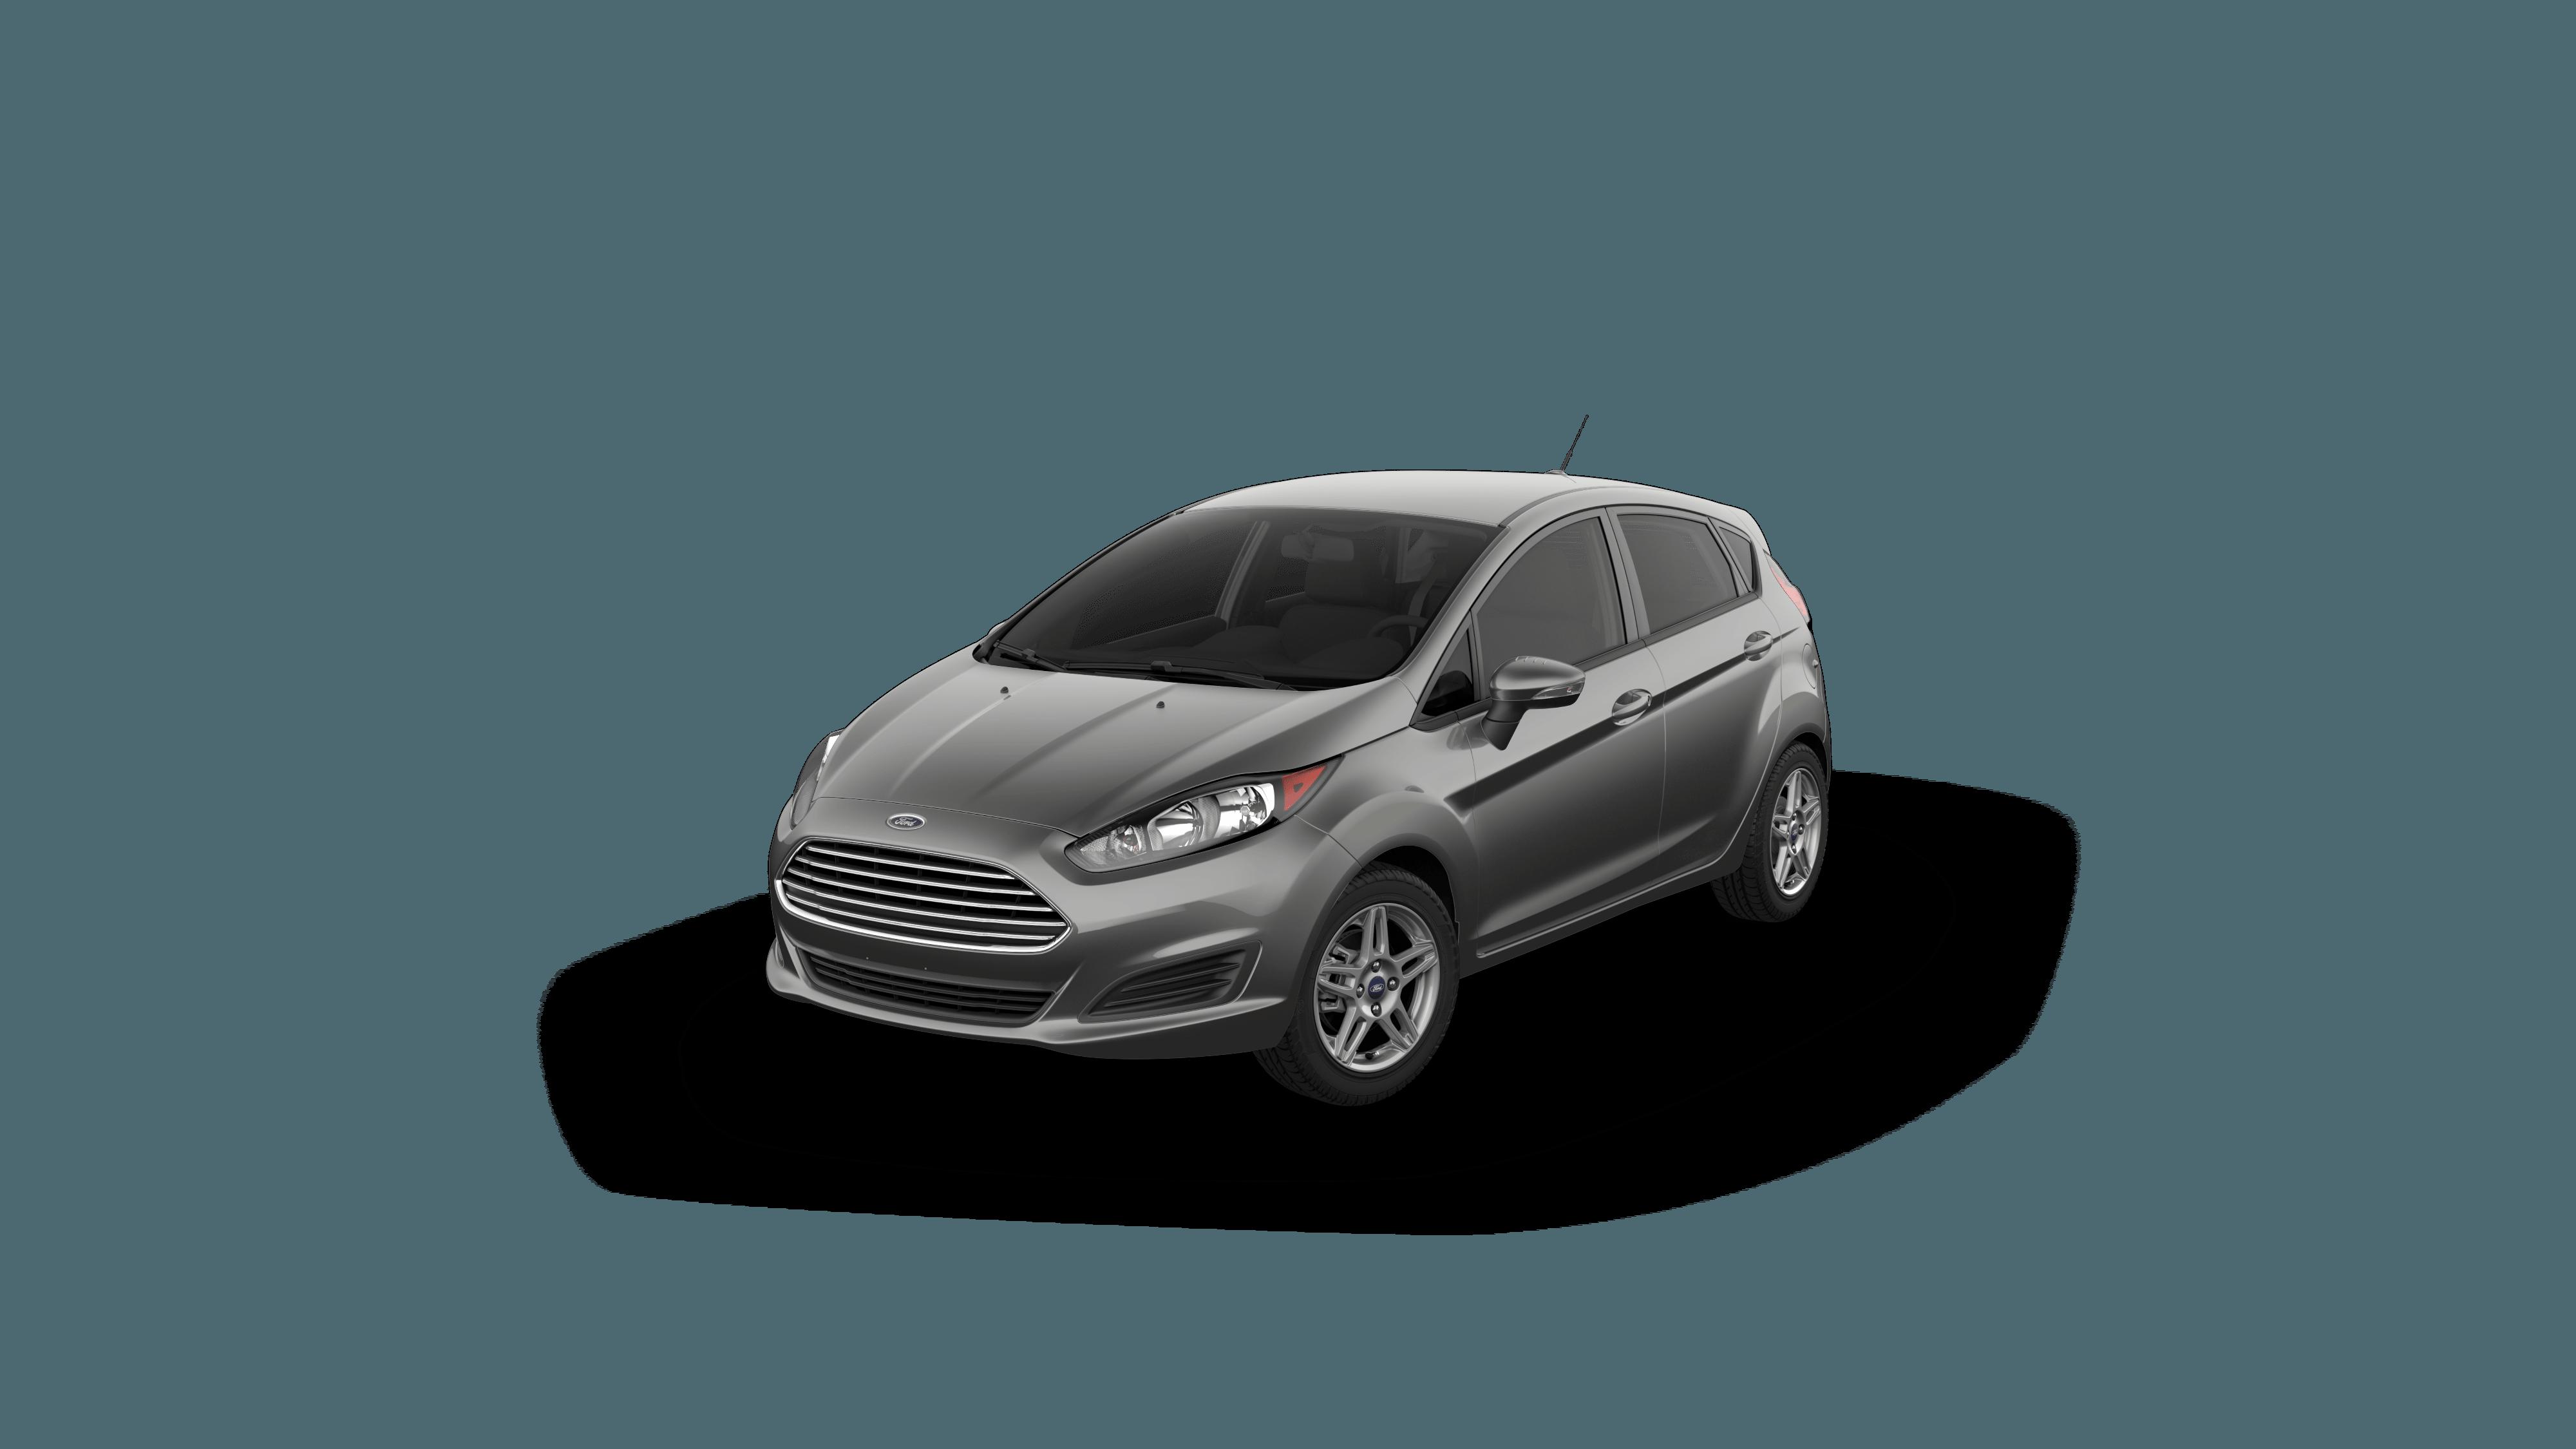 2019 Ford Fiesta Vehicle Photo in Souderton, PA 18964-1038